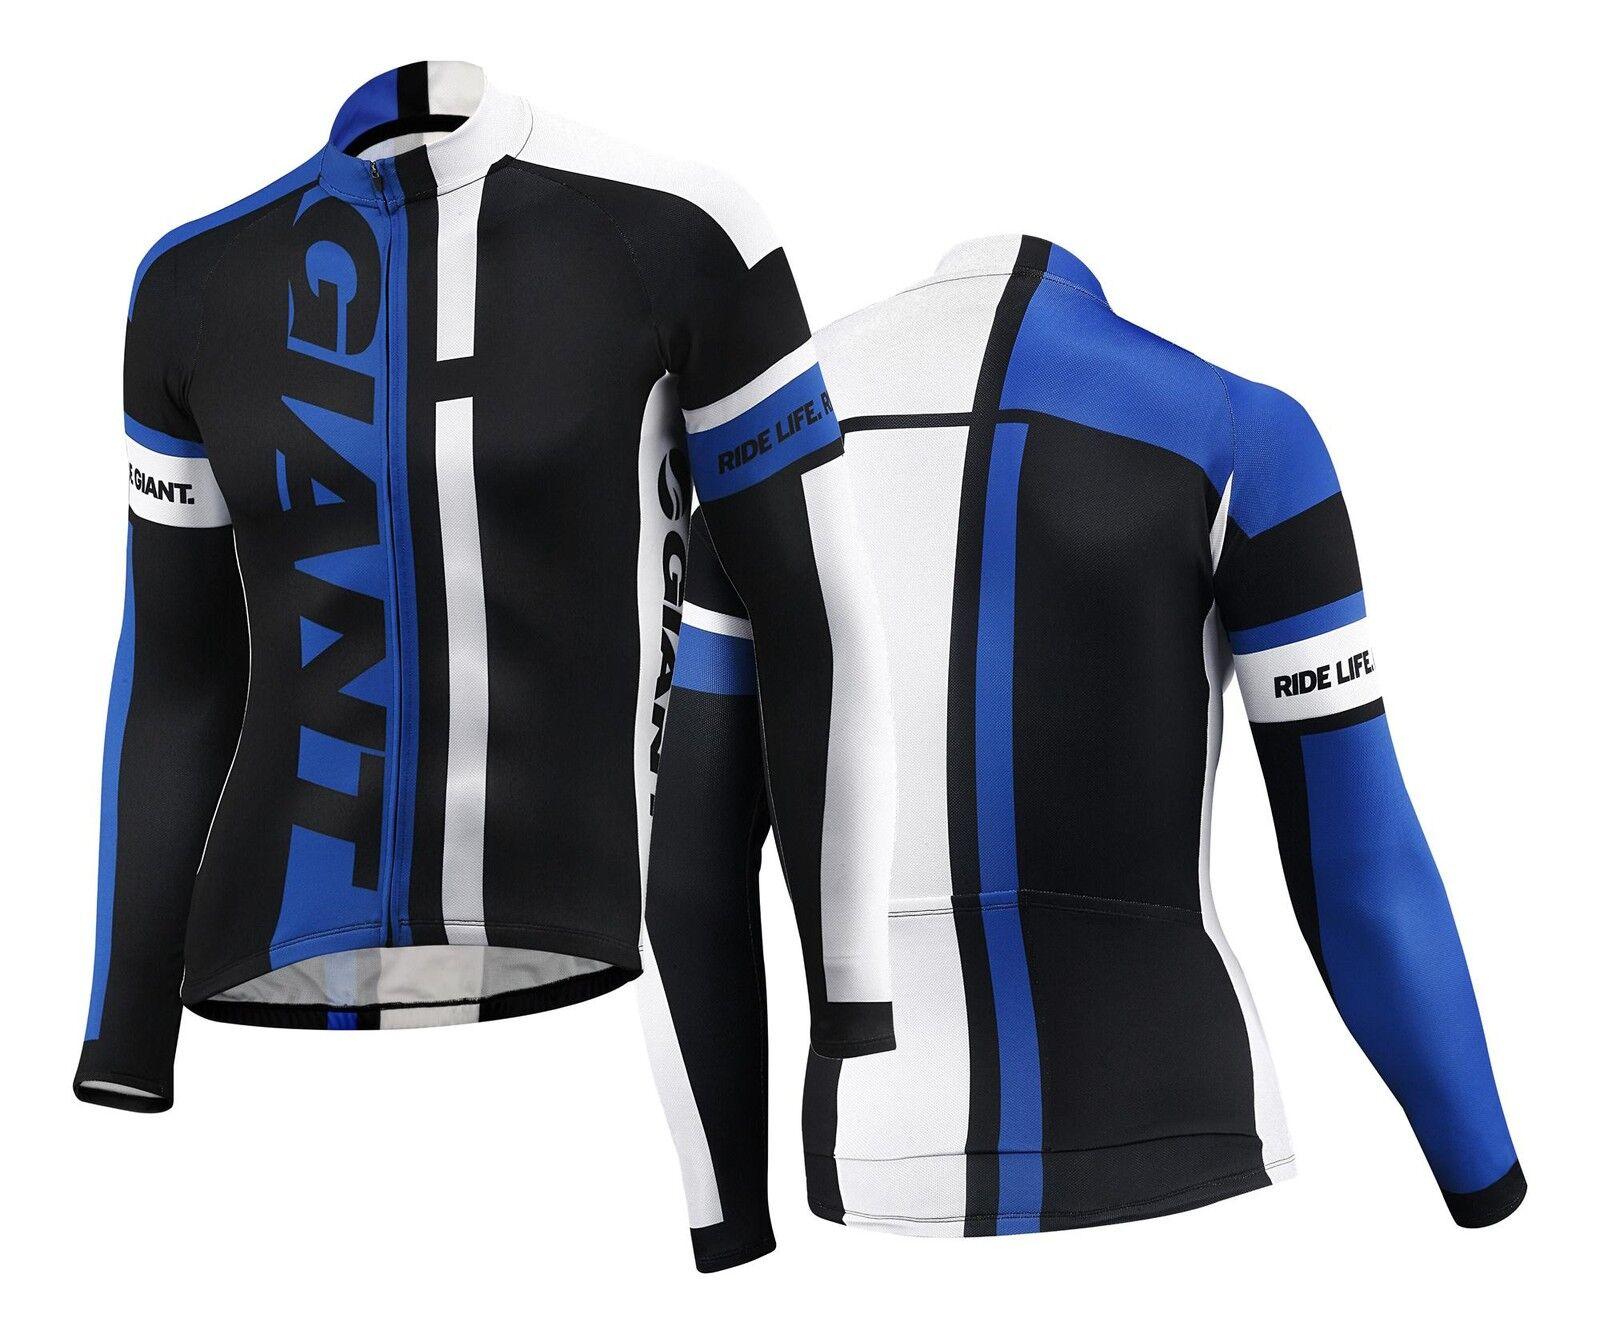 GIANT maglia bici ciclismo corsa mtb manica lunga long sleeve jersey bike blue GT